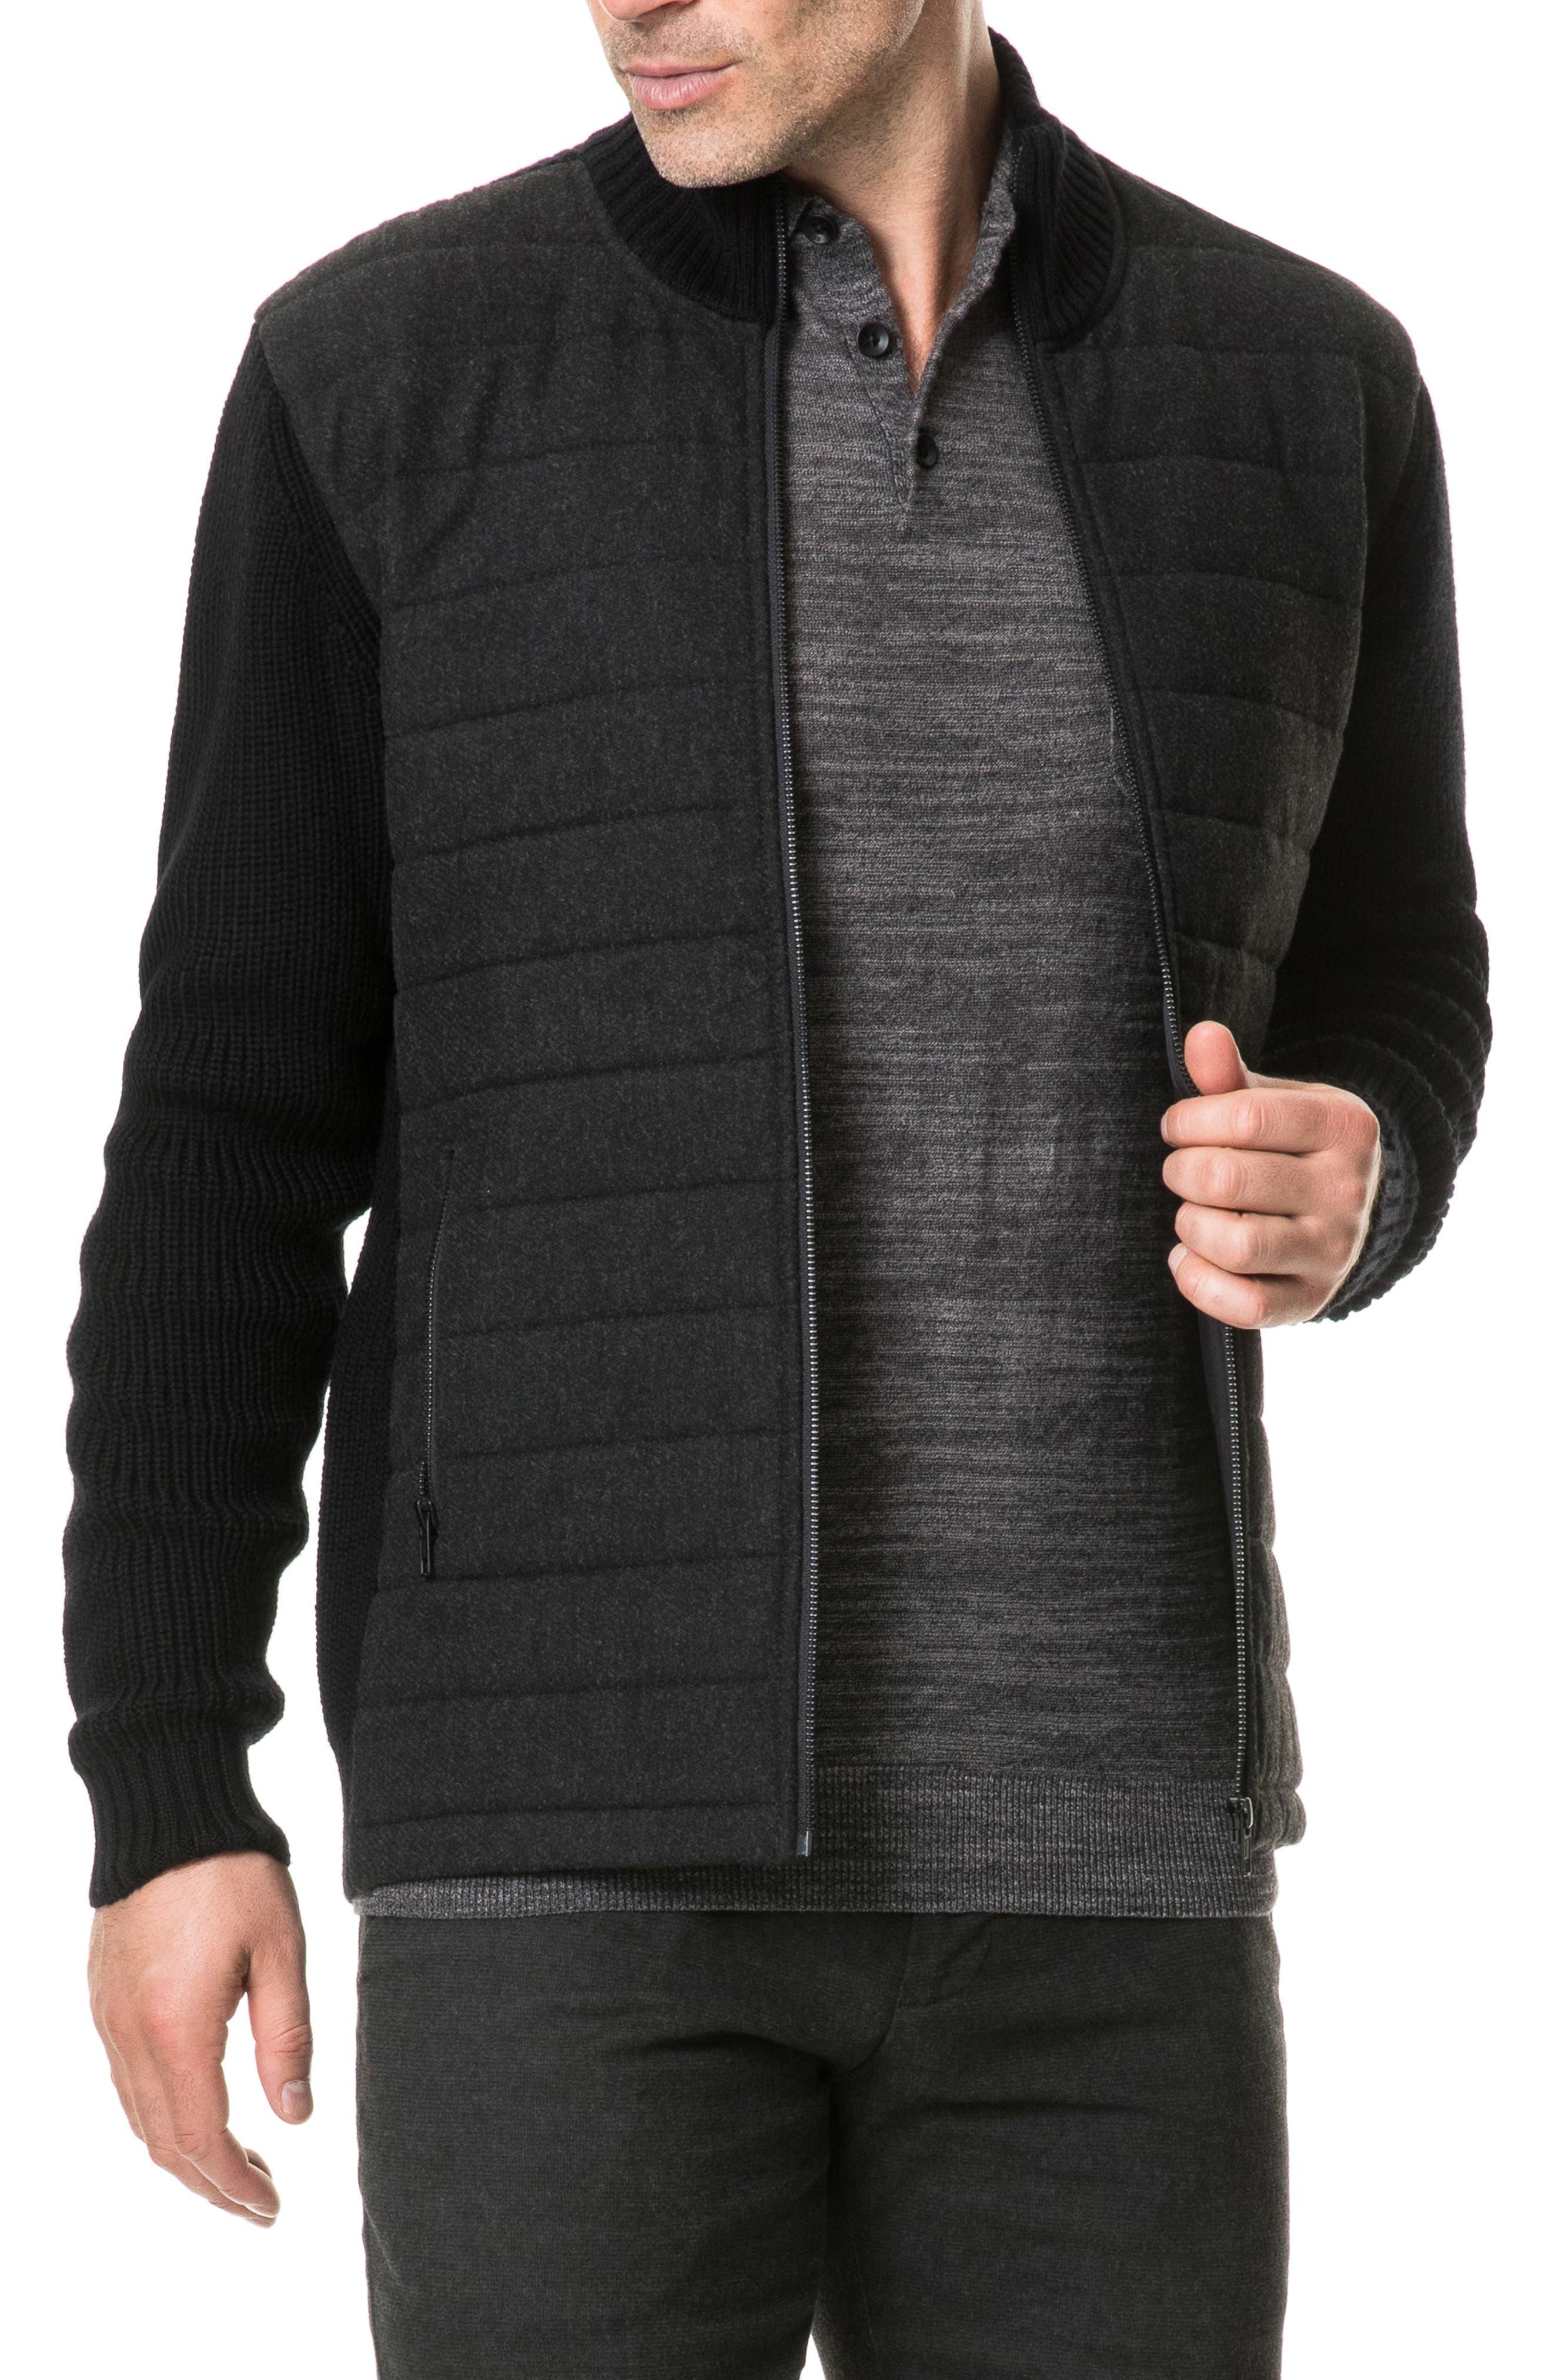 Greerton Regular Fit Zip Sweater,                             Alternate thumbnail 4, color,                             ONYX